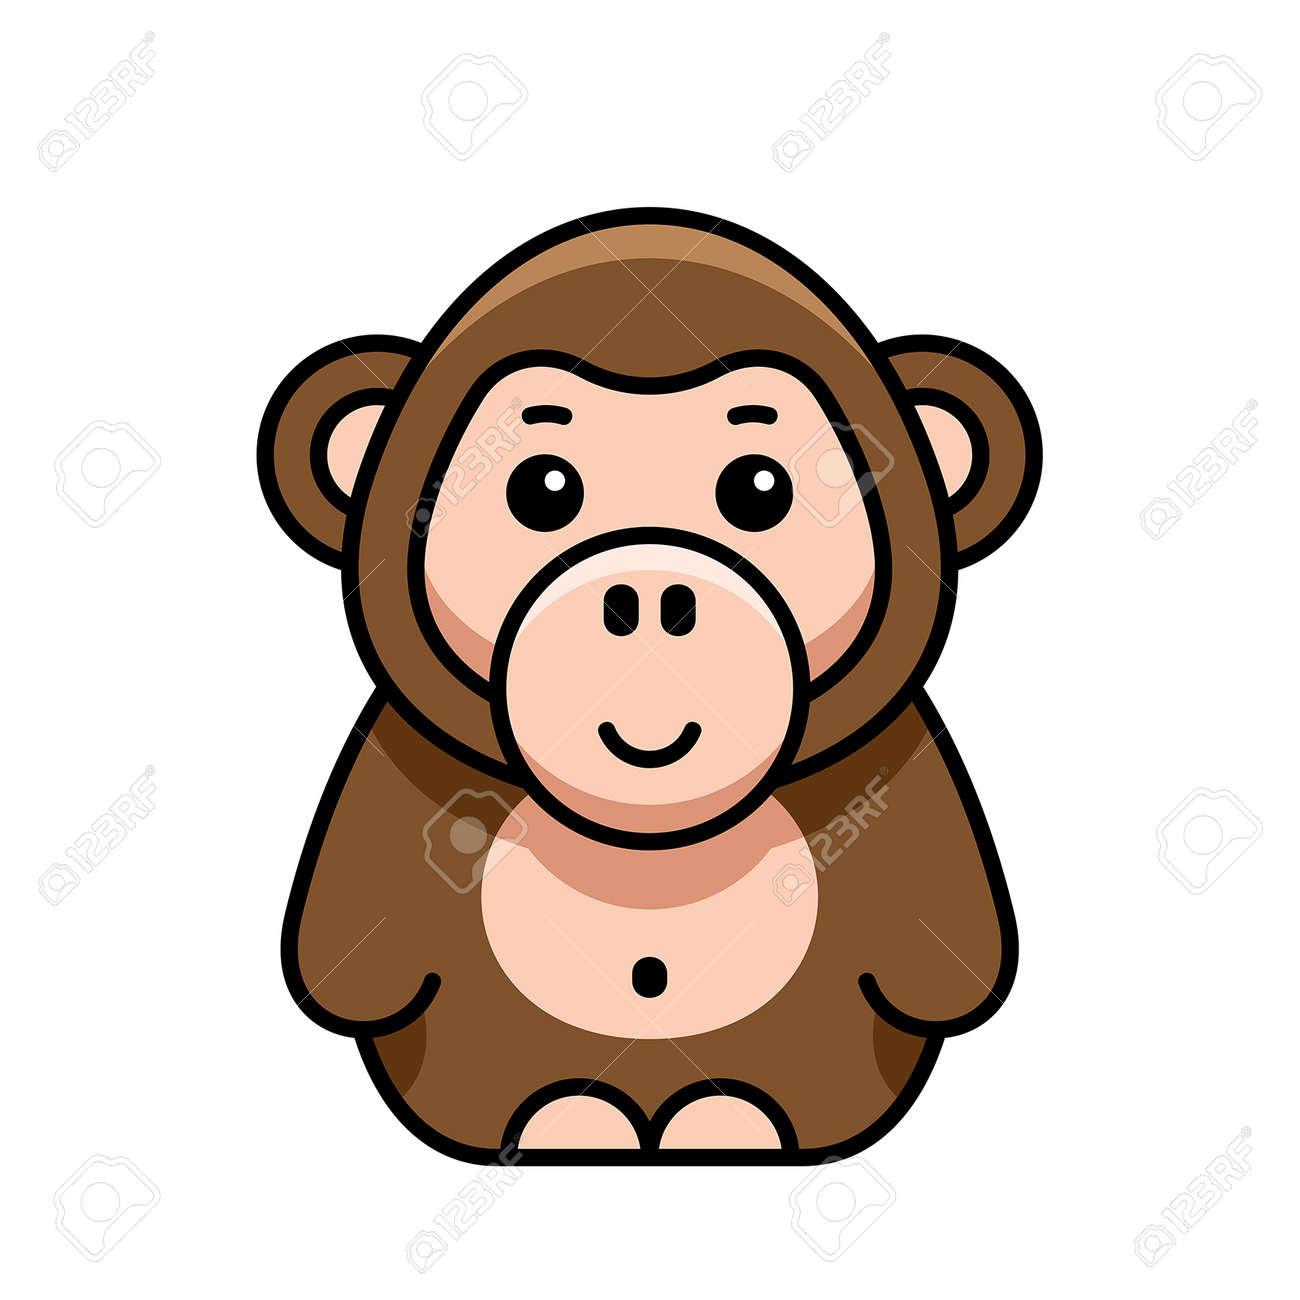 Monkey icon. Icon design. Template elements - 171231638